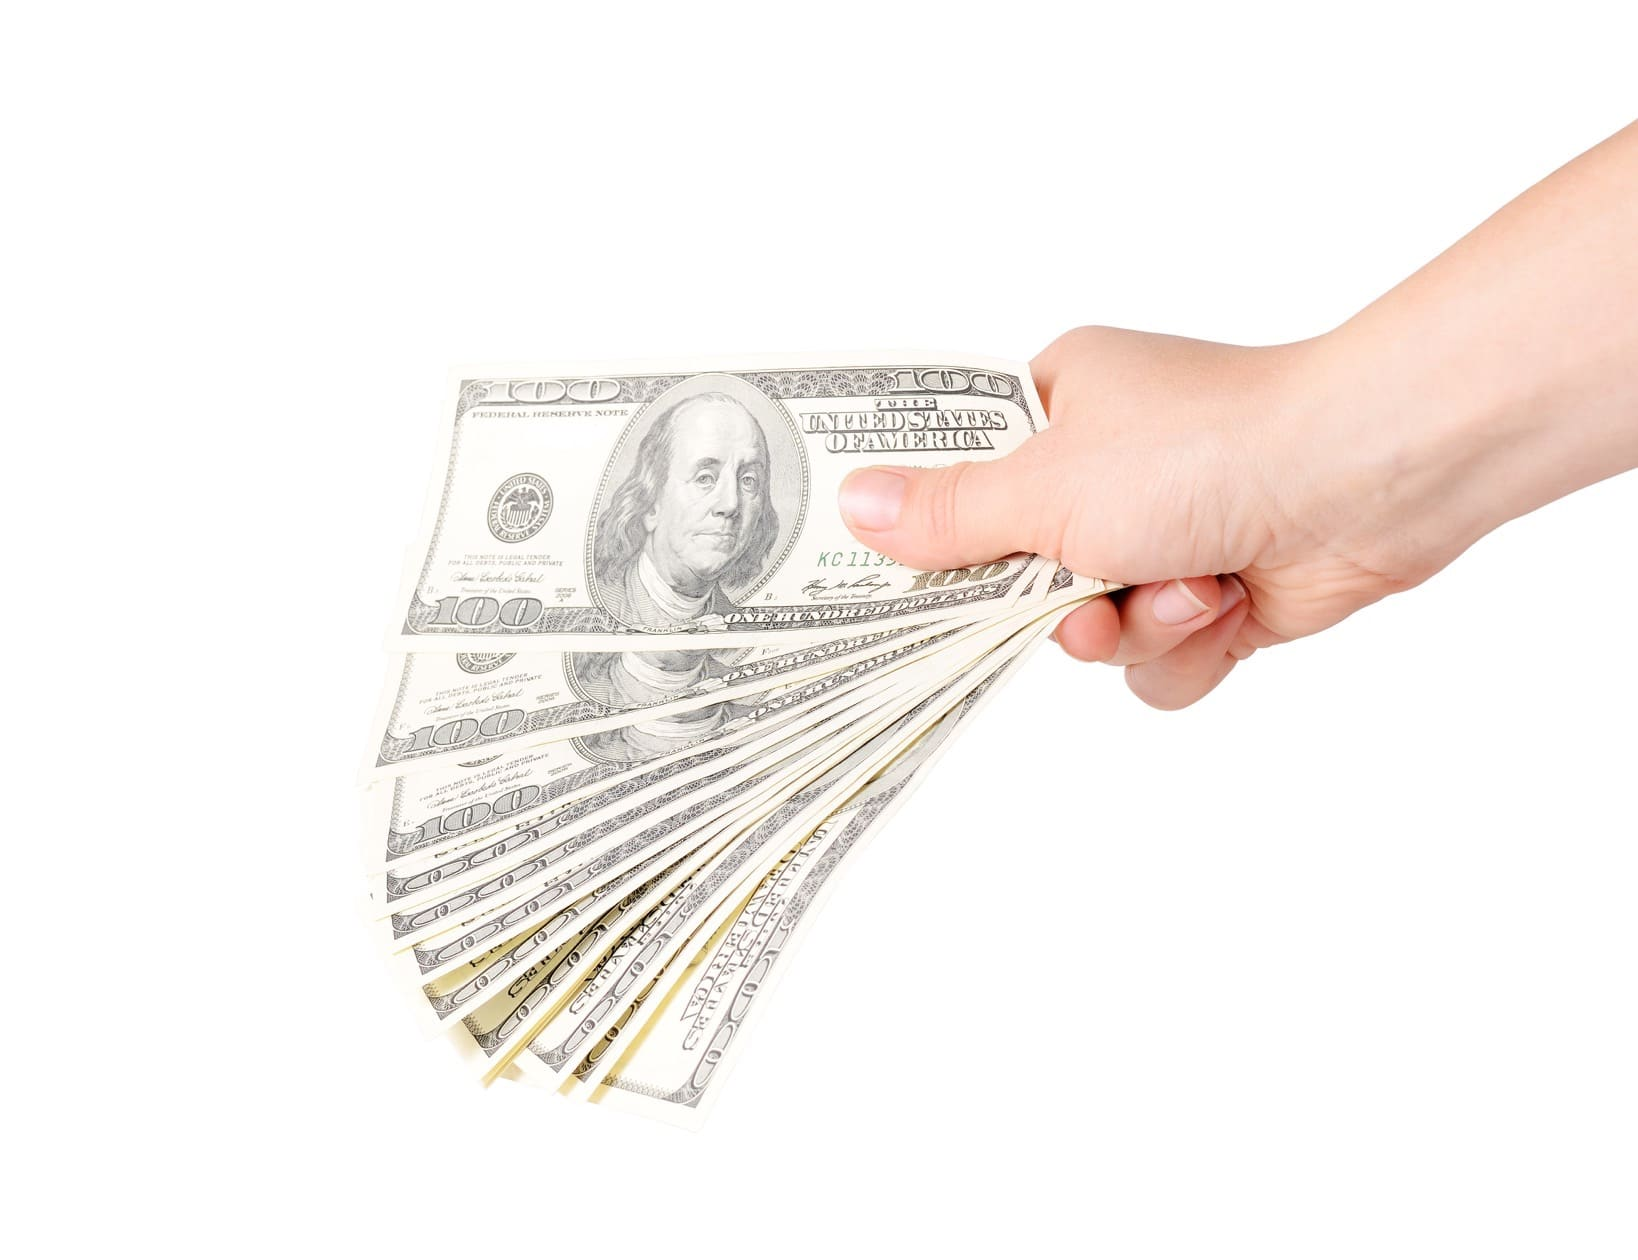 hand holds cash